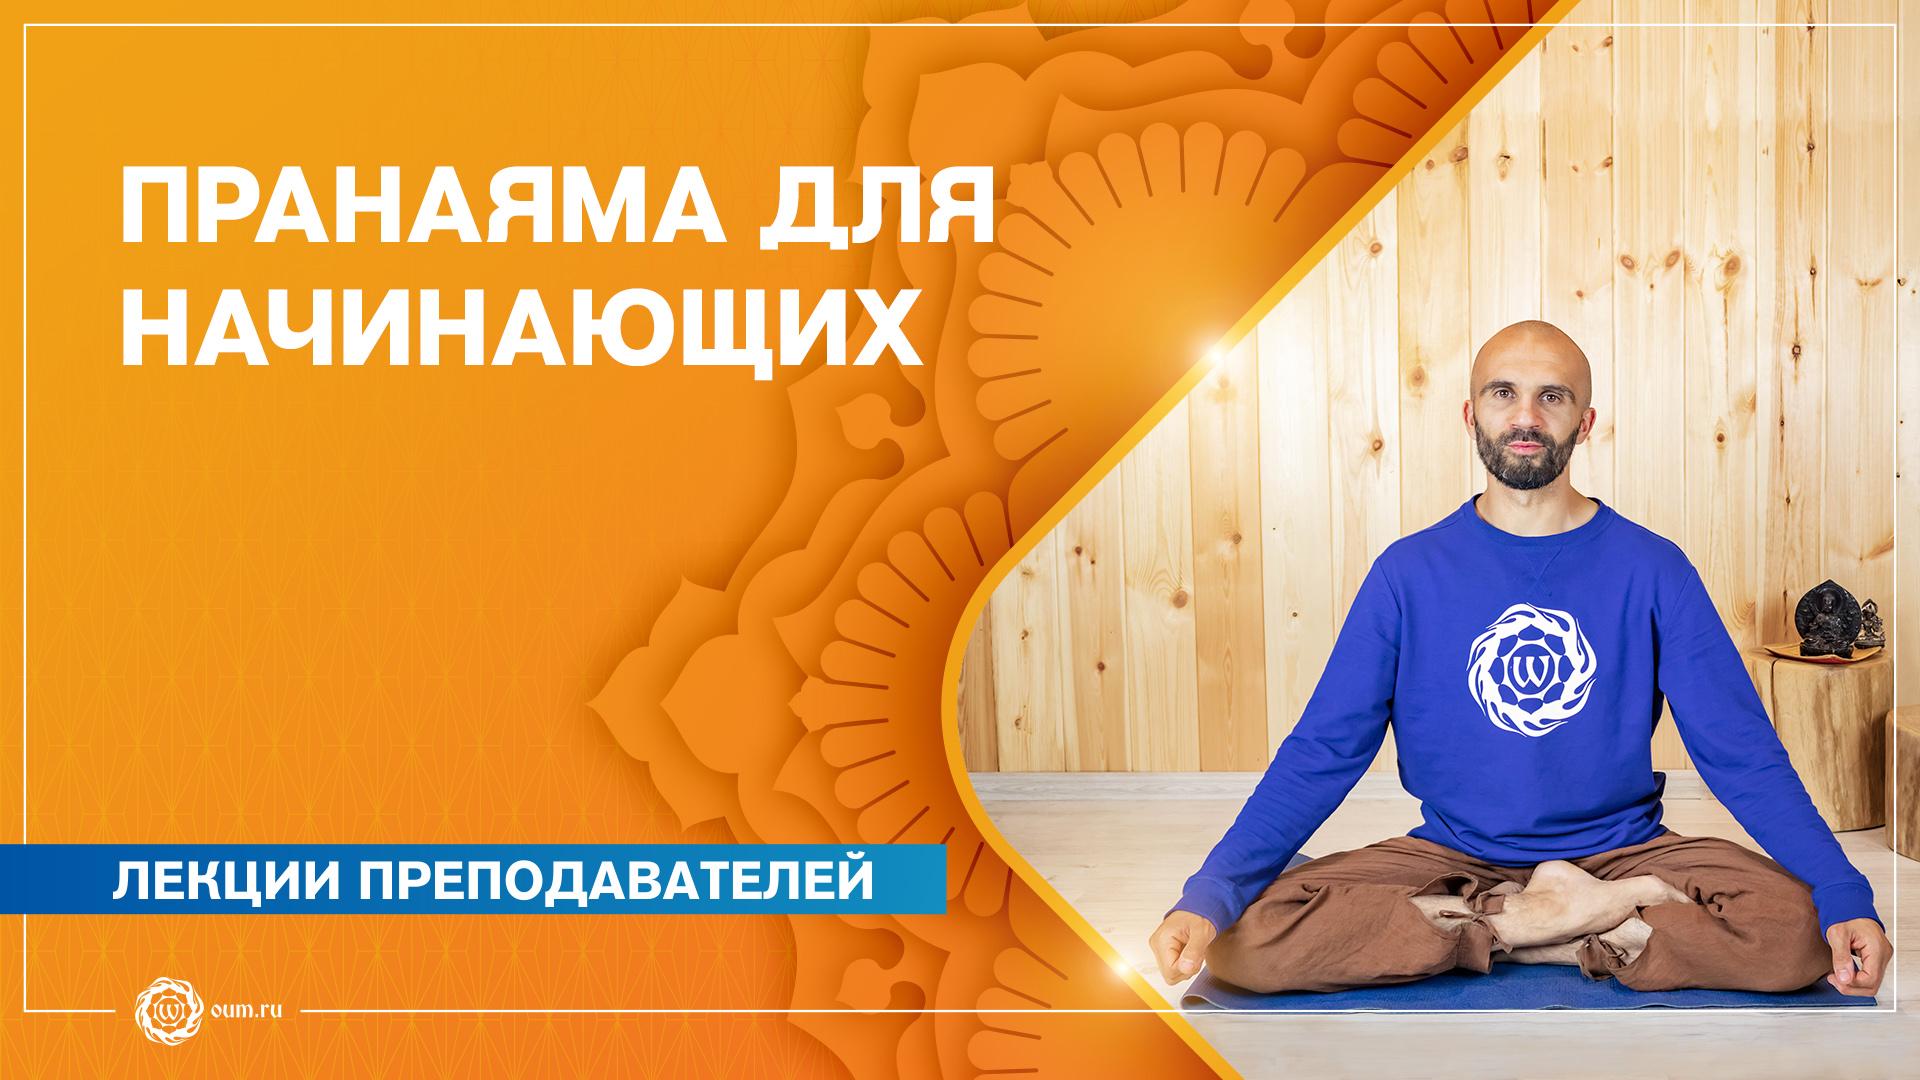 Пранаяма для начинающих. Павел Каминский